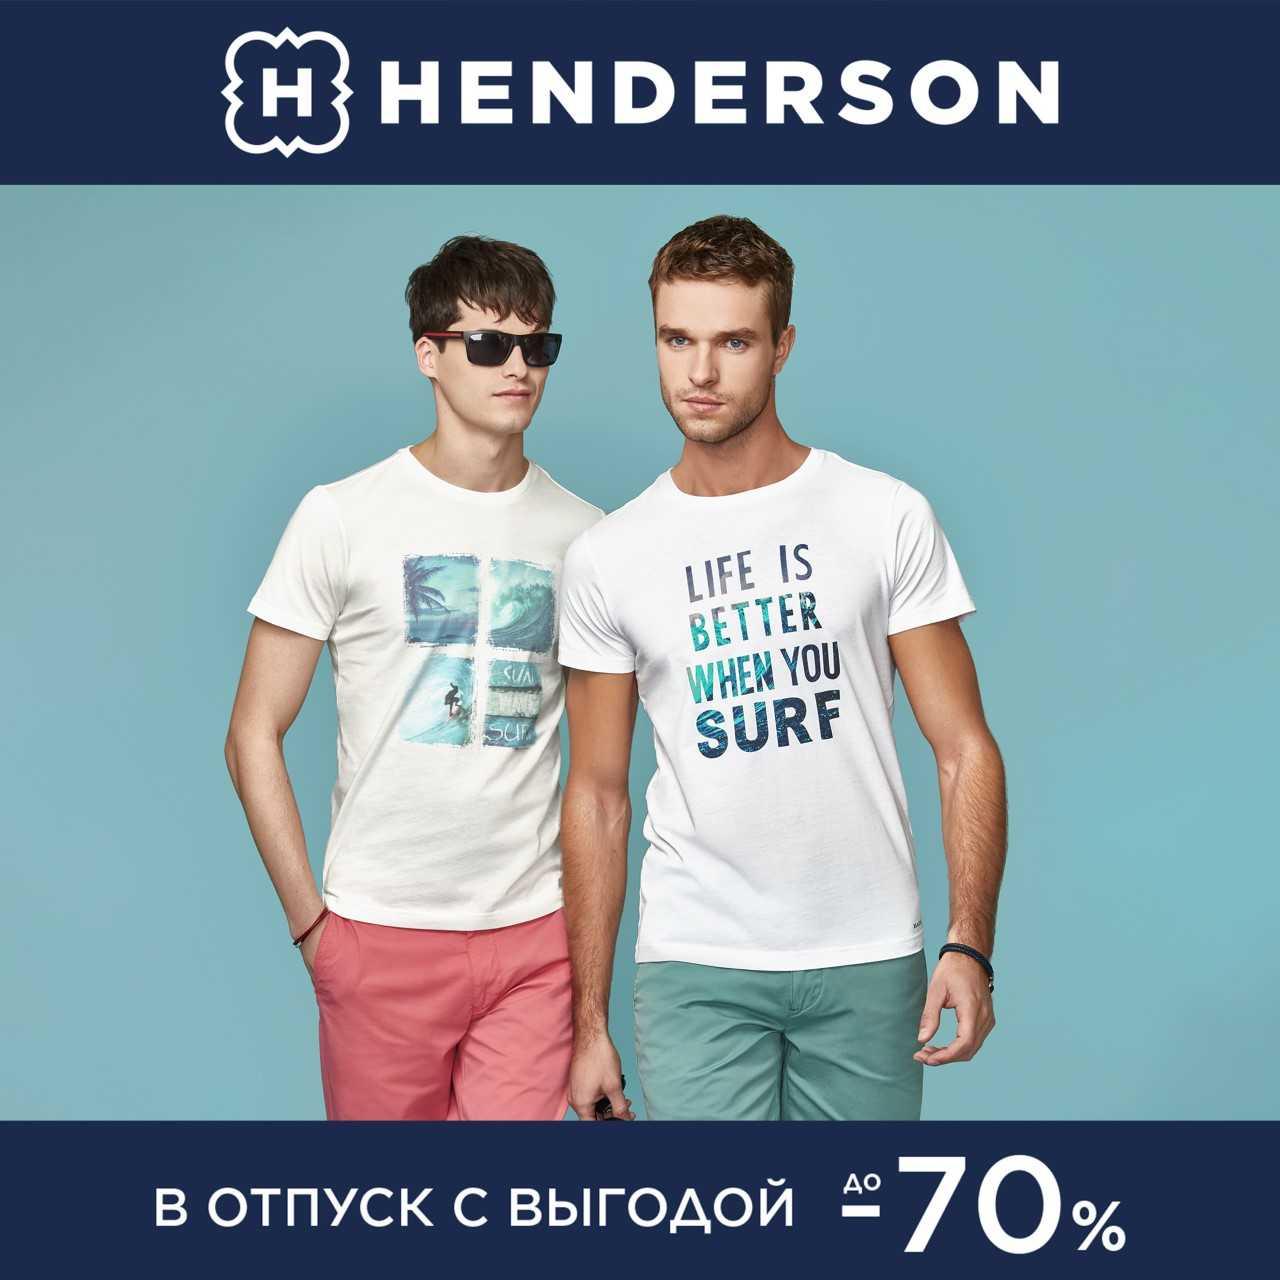 акция в магазине Henderson